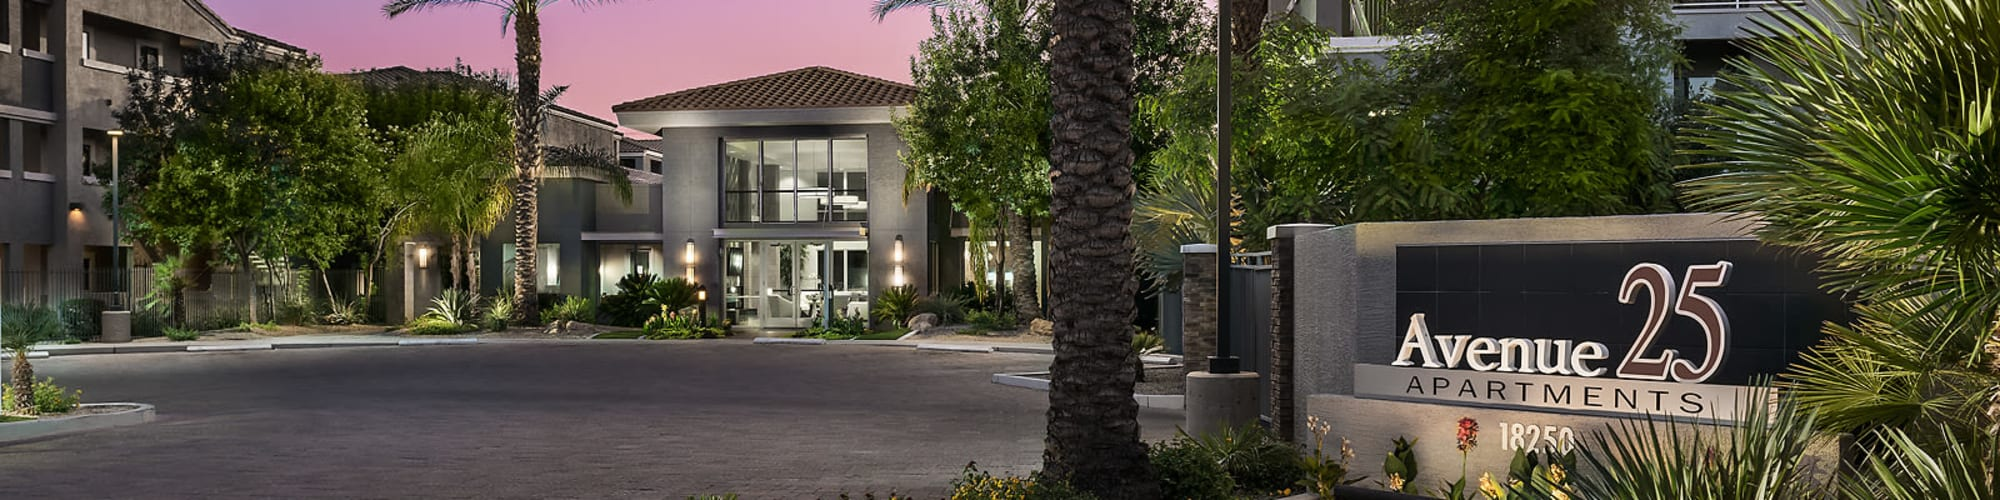 Contact us at Avenue 25 Apartments in Phoenix, Arizona